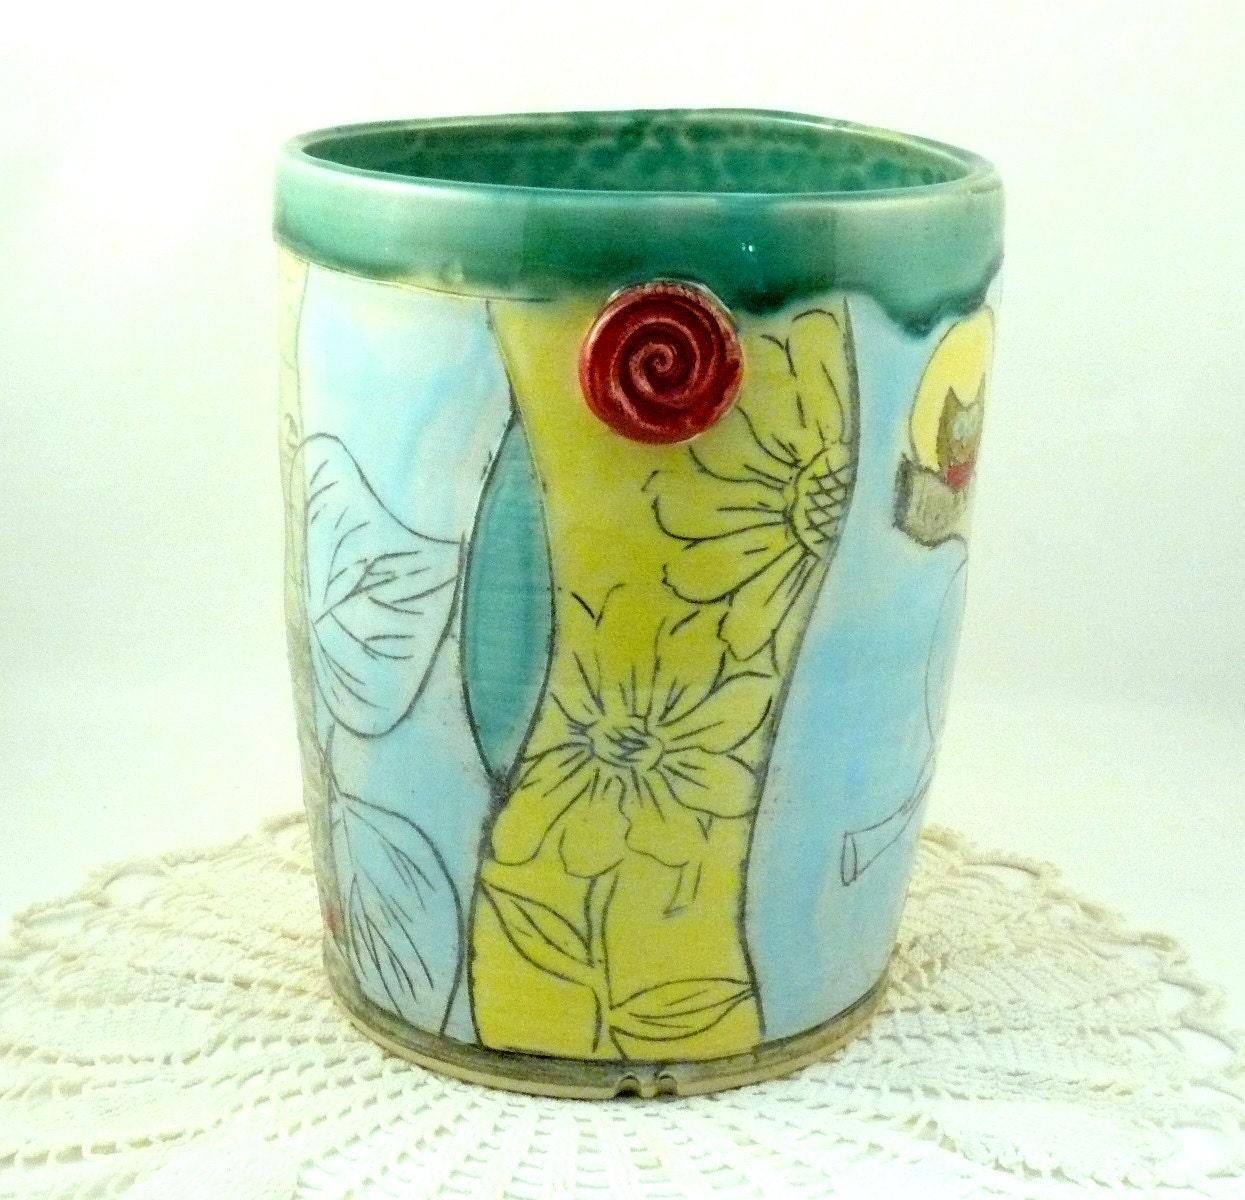 Ceramic Utensil Holder in woodland design - ice bucket or wine bottle holder - BlueSkyPotteryCO